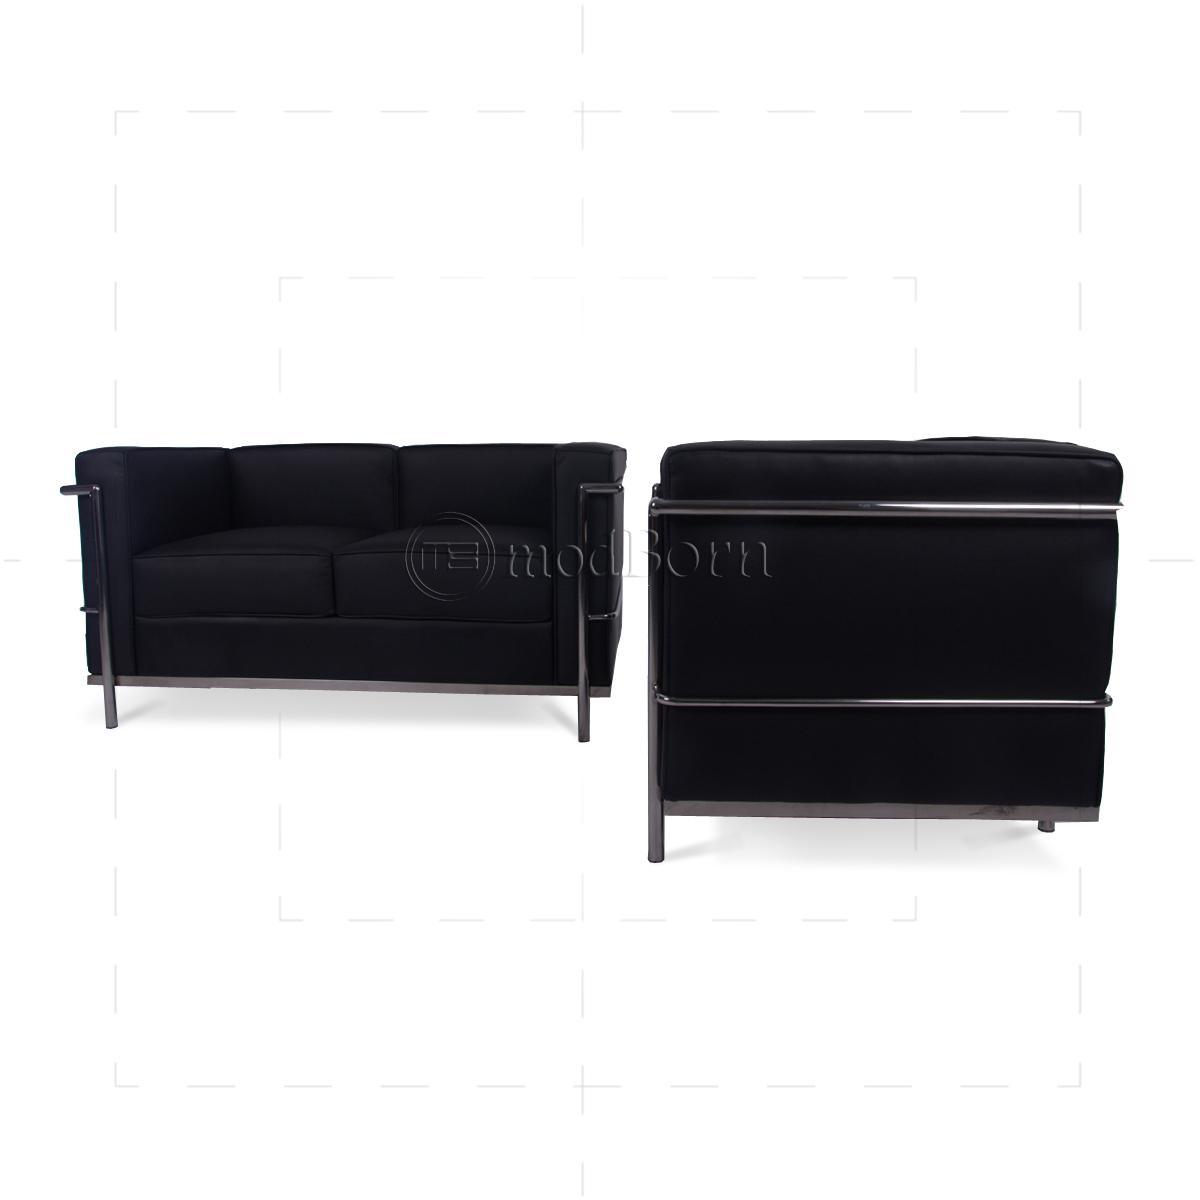 Belgium Leather Sofas Le Corbusier Style LC2 Sofa 2 Seater Black Leather - Replica